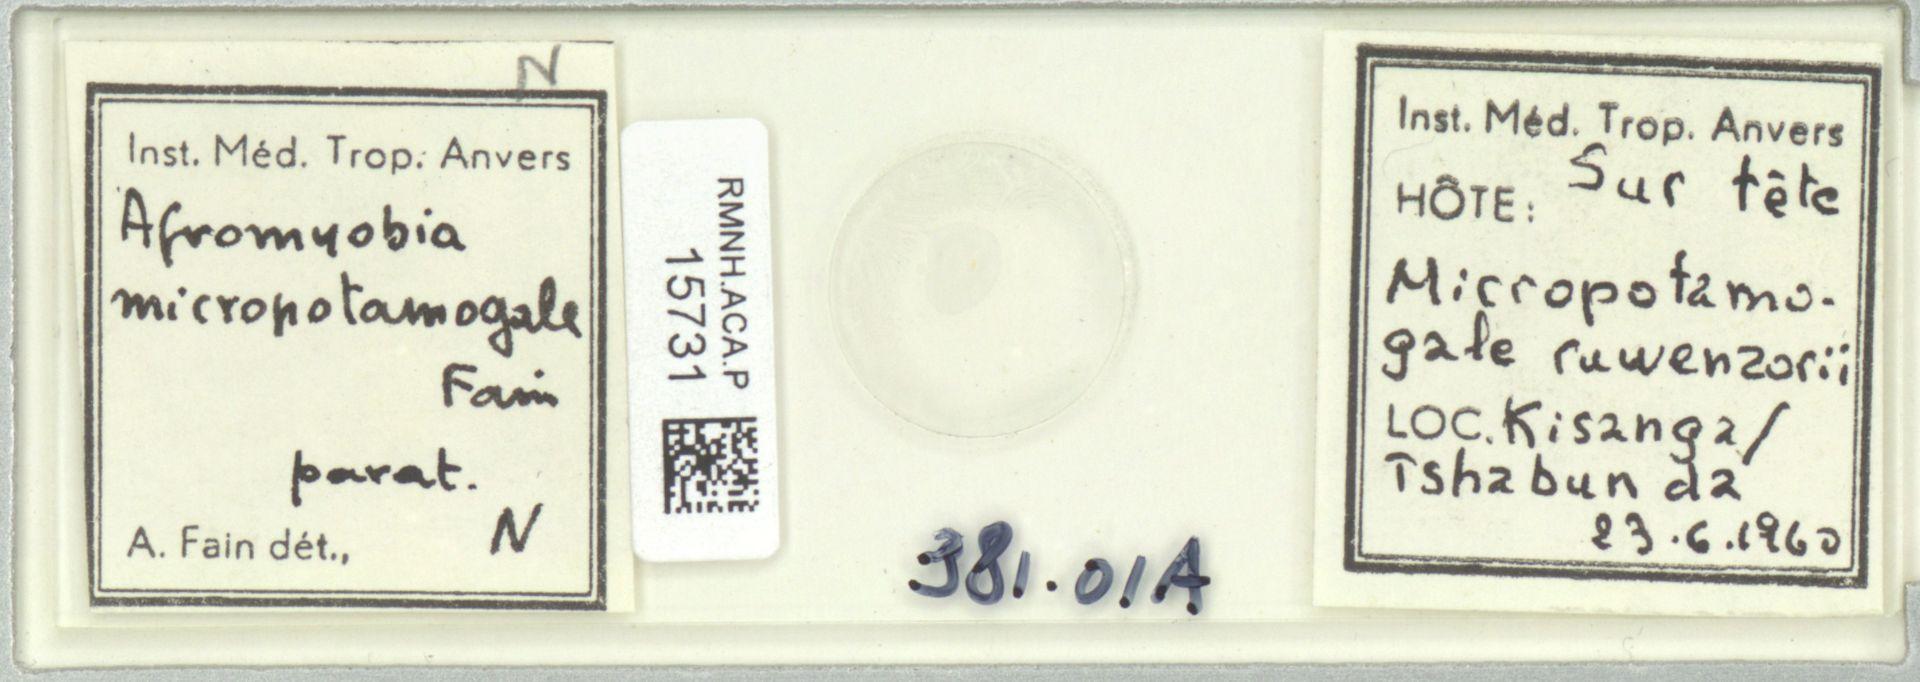 RMNH.ACA.P.15731 | Afromyobia micropotamogale